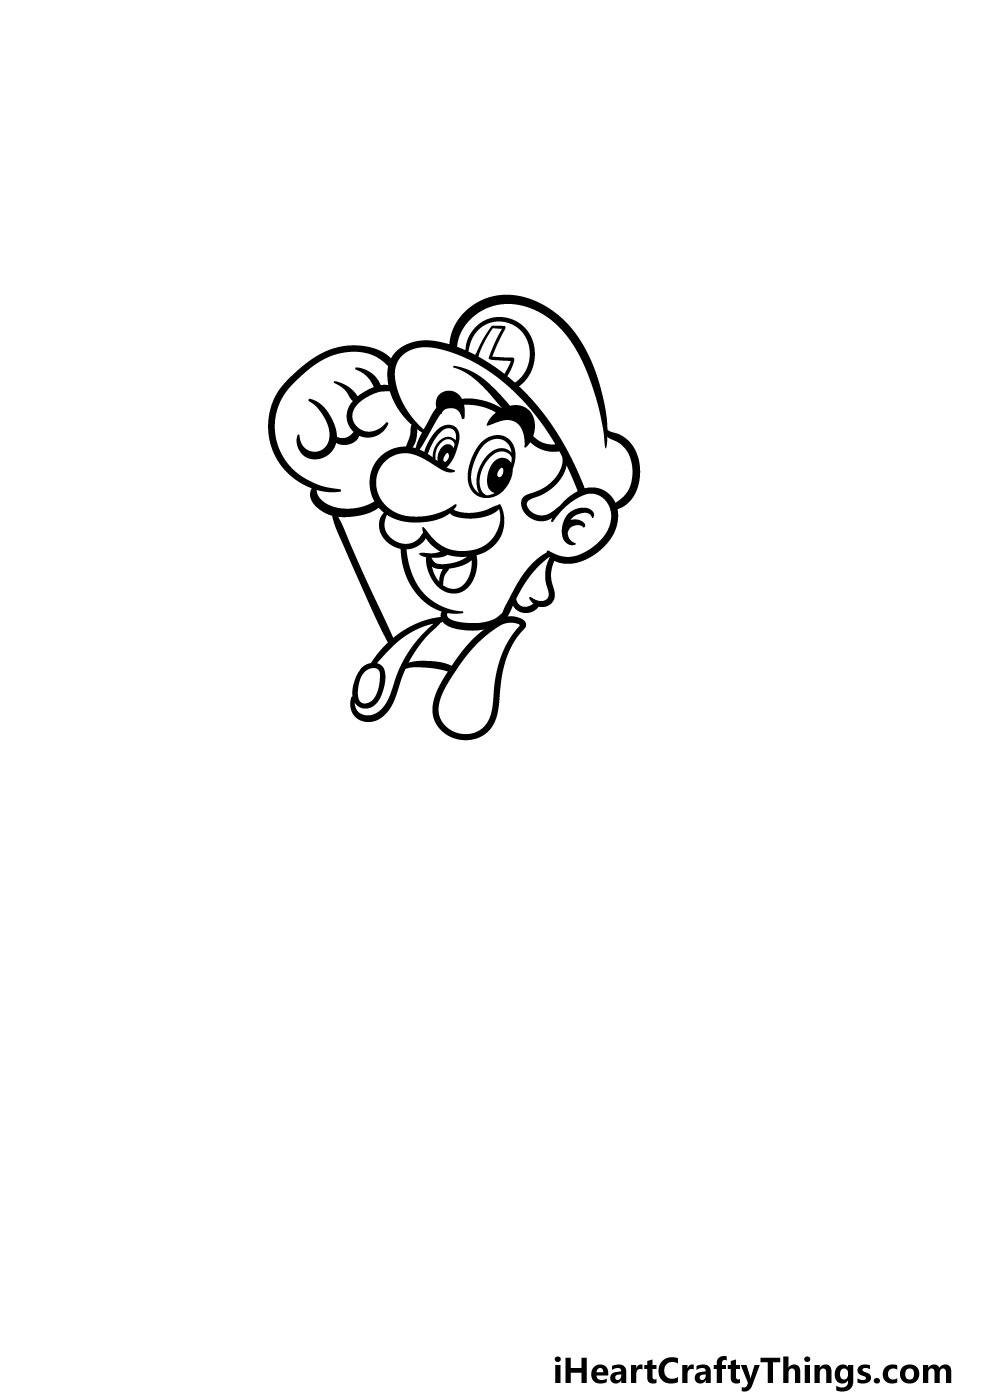 drawing luigi step 3